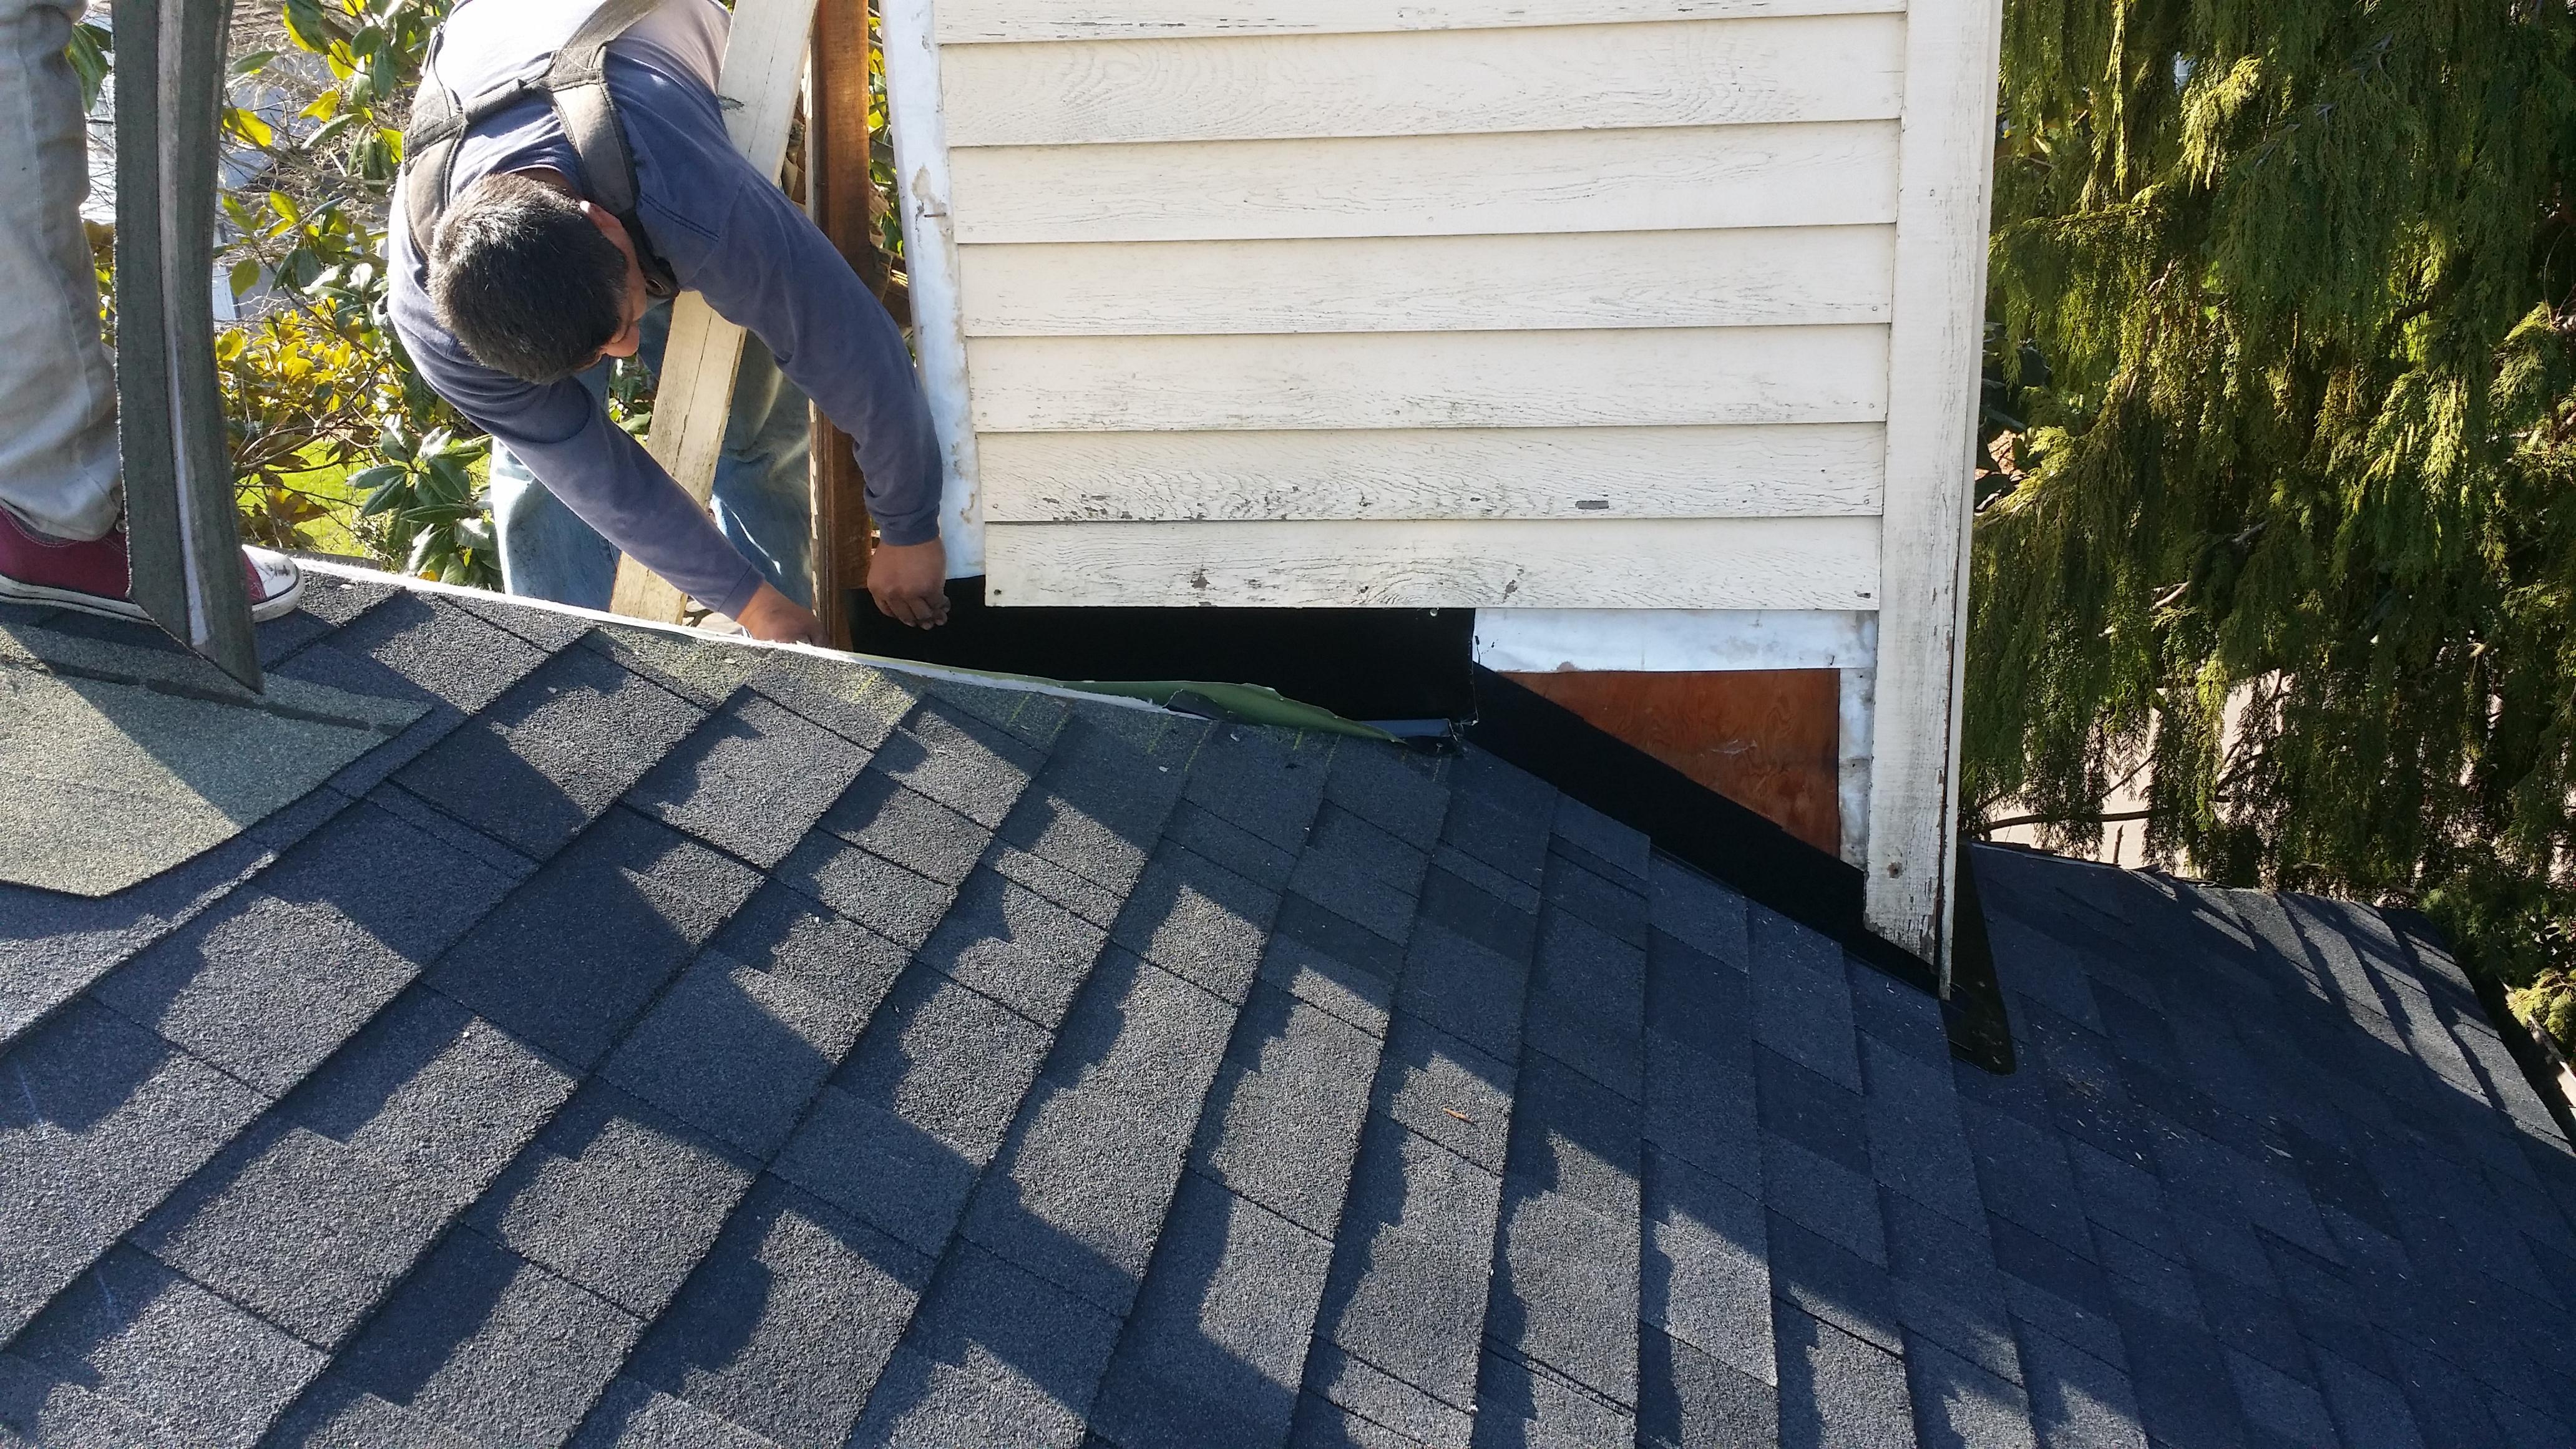 Roofing Rain OR Shine, LLC image 2